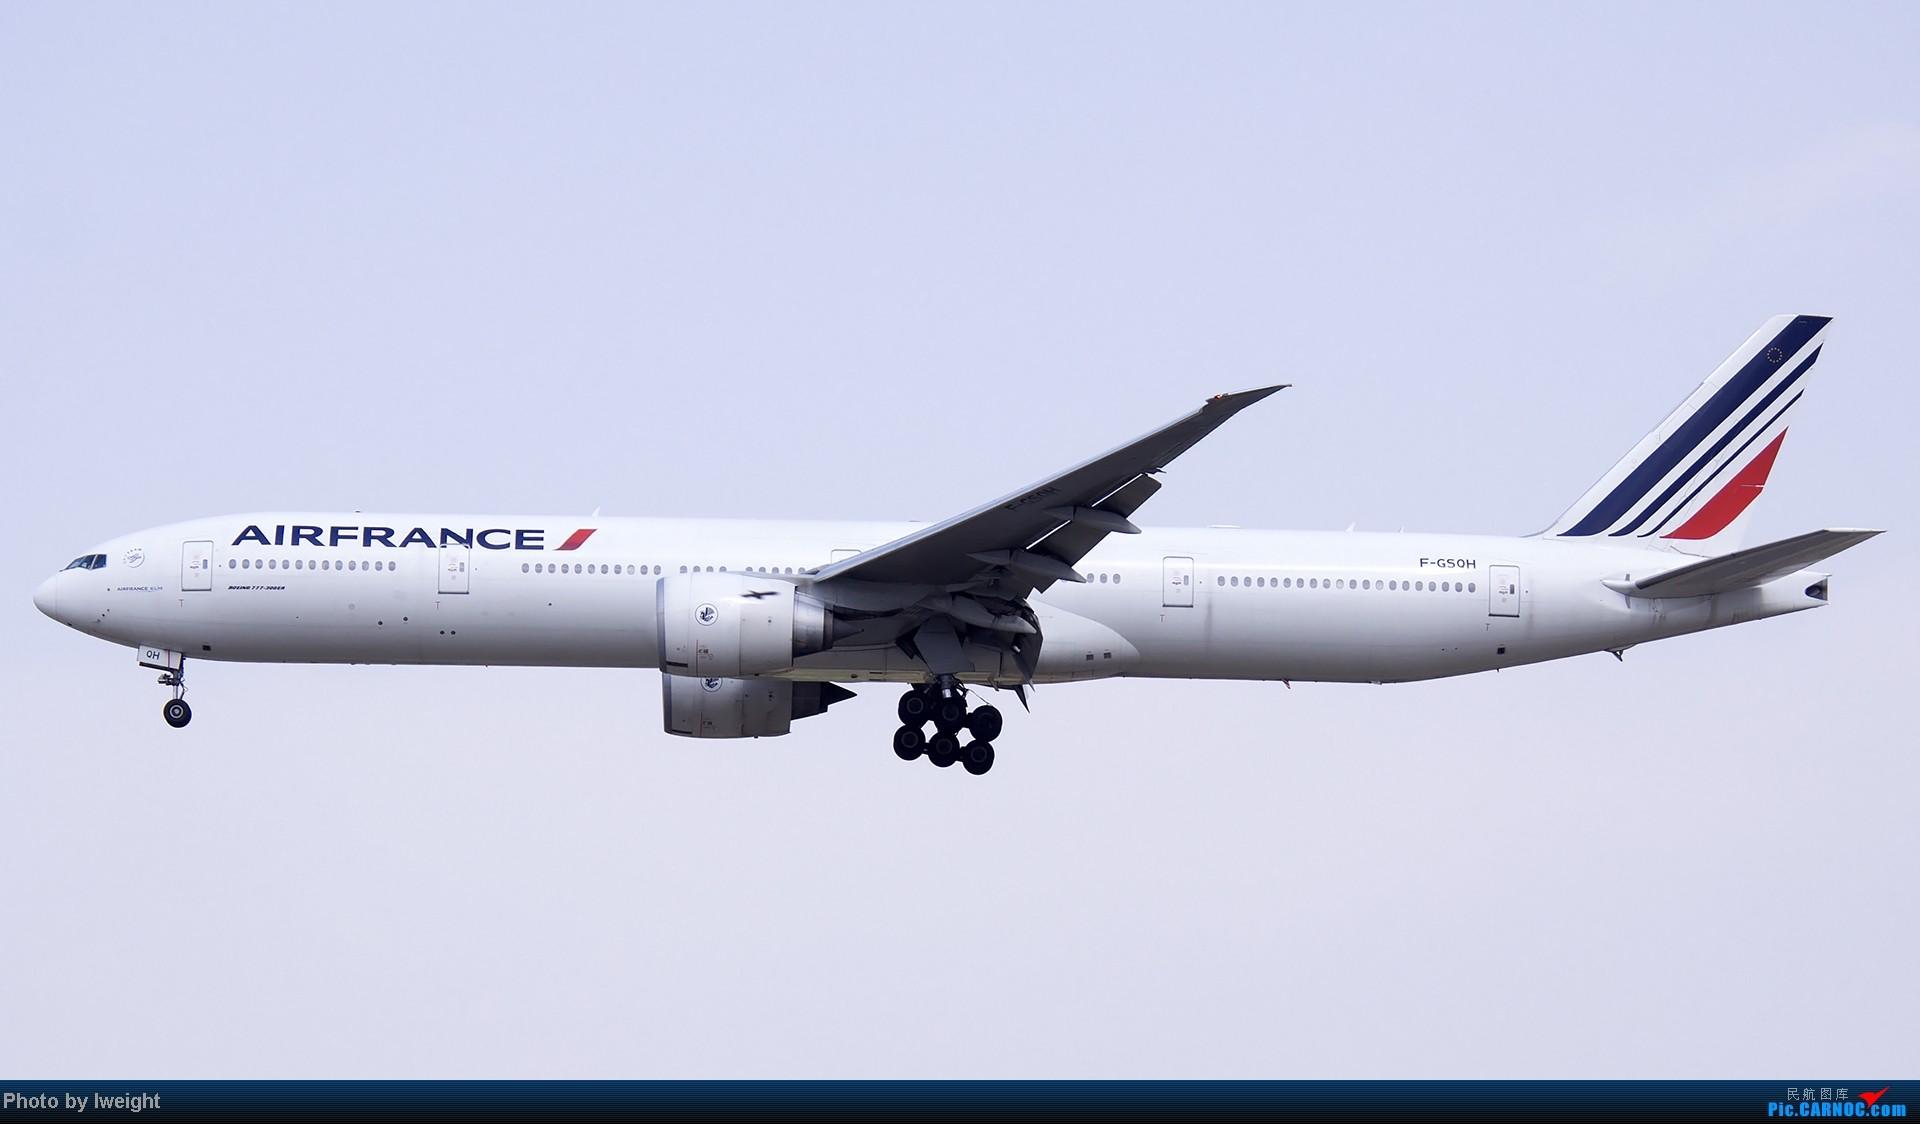 Re:[原创]5月3日首都机场风云变幻的下午 BOEING 777-300 F-GSQH 中国北京首都机场